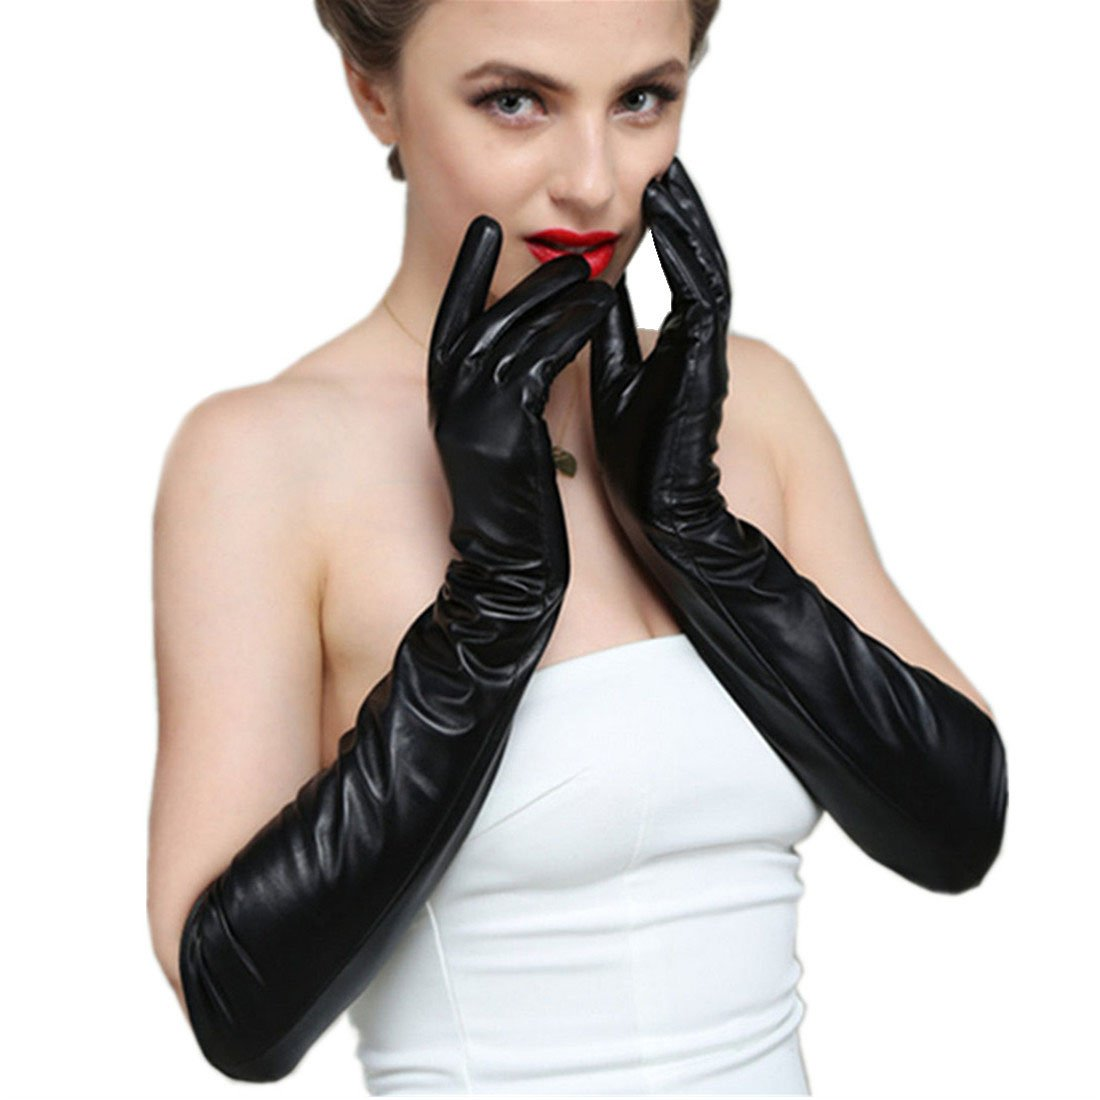 D.King Women Genuine Lambskin Leather Gloves Touchscreen Texting Opera Long Evening Dress Driving Gloves 50CM/L